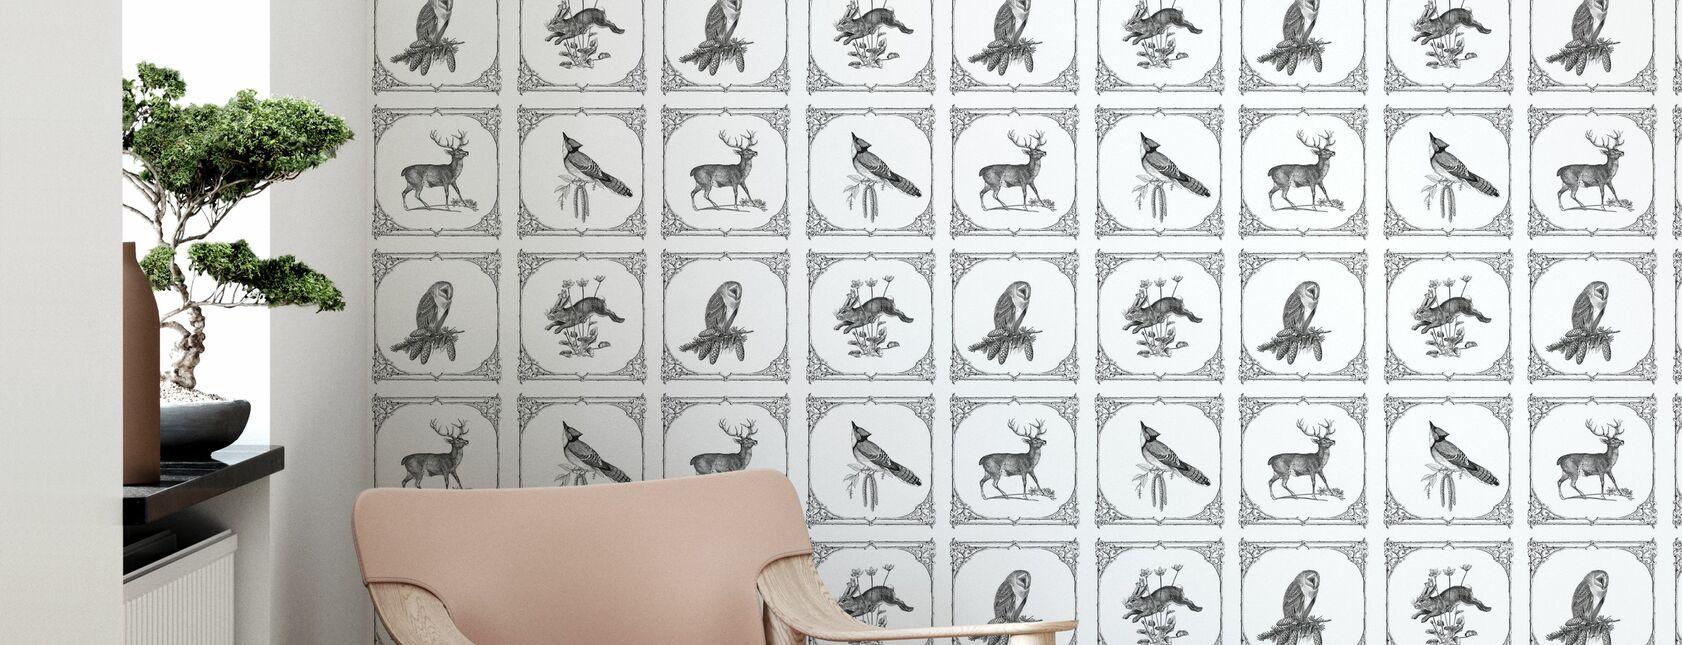 Friends in Need - Wallpaper - Living Room